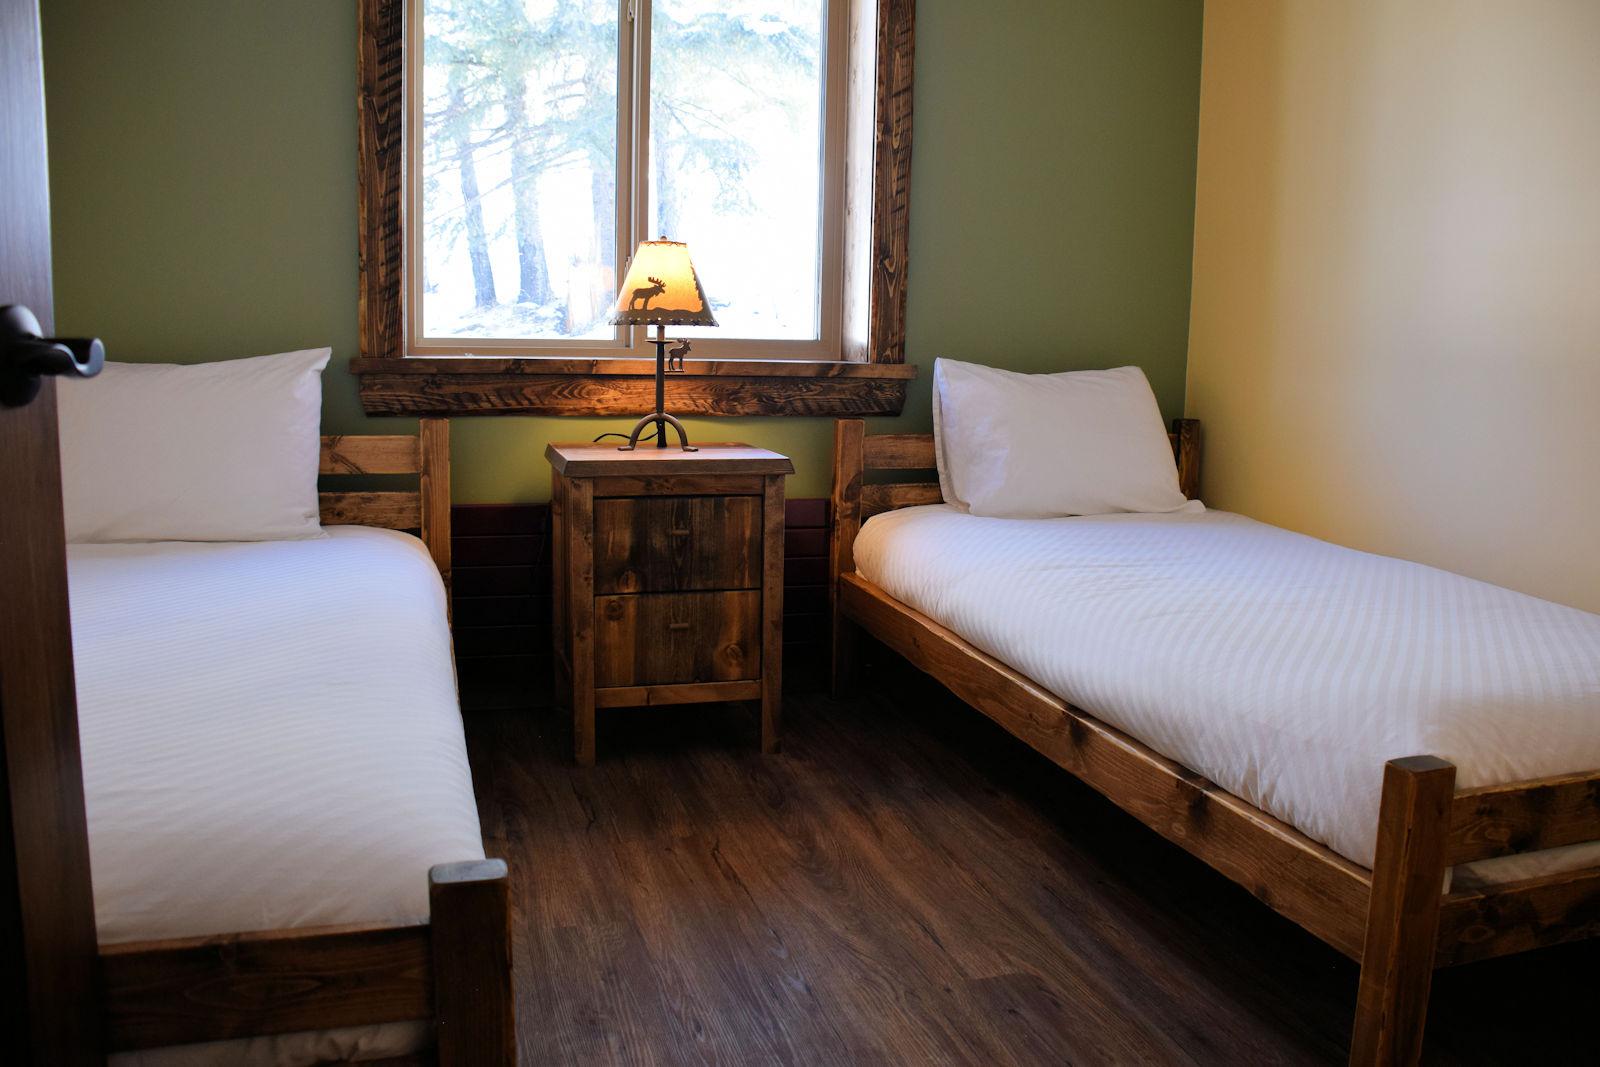 https://0901.nccdn.net/4_2/000/000/024/ec9/twin-bedroom-1600x1067.jpg